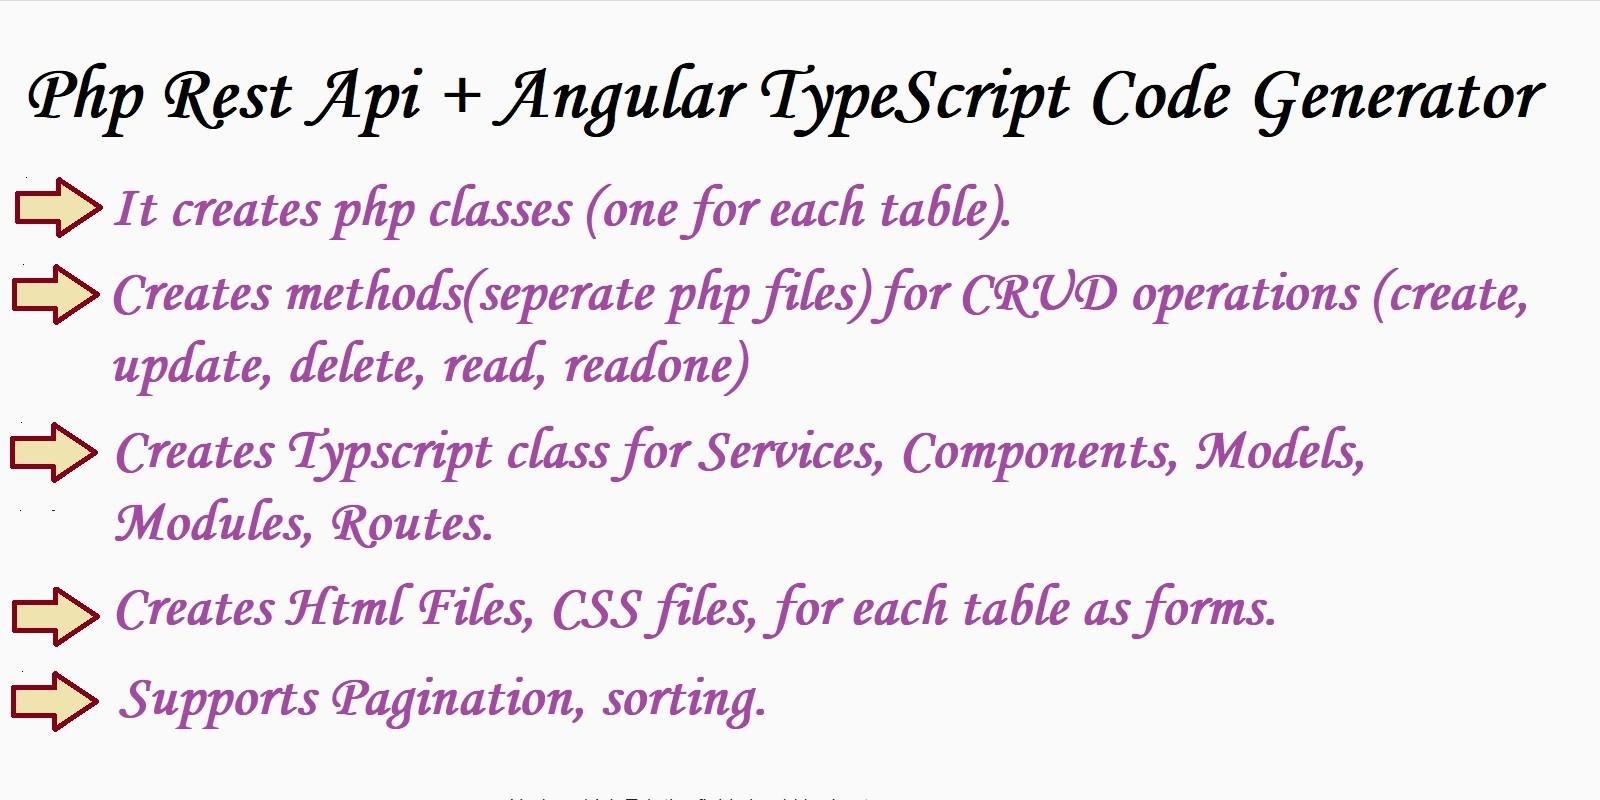 PHP Rest Api And Angular TypeScript Code Generator